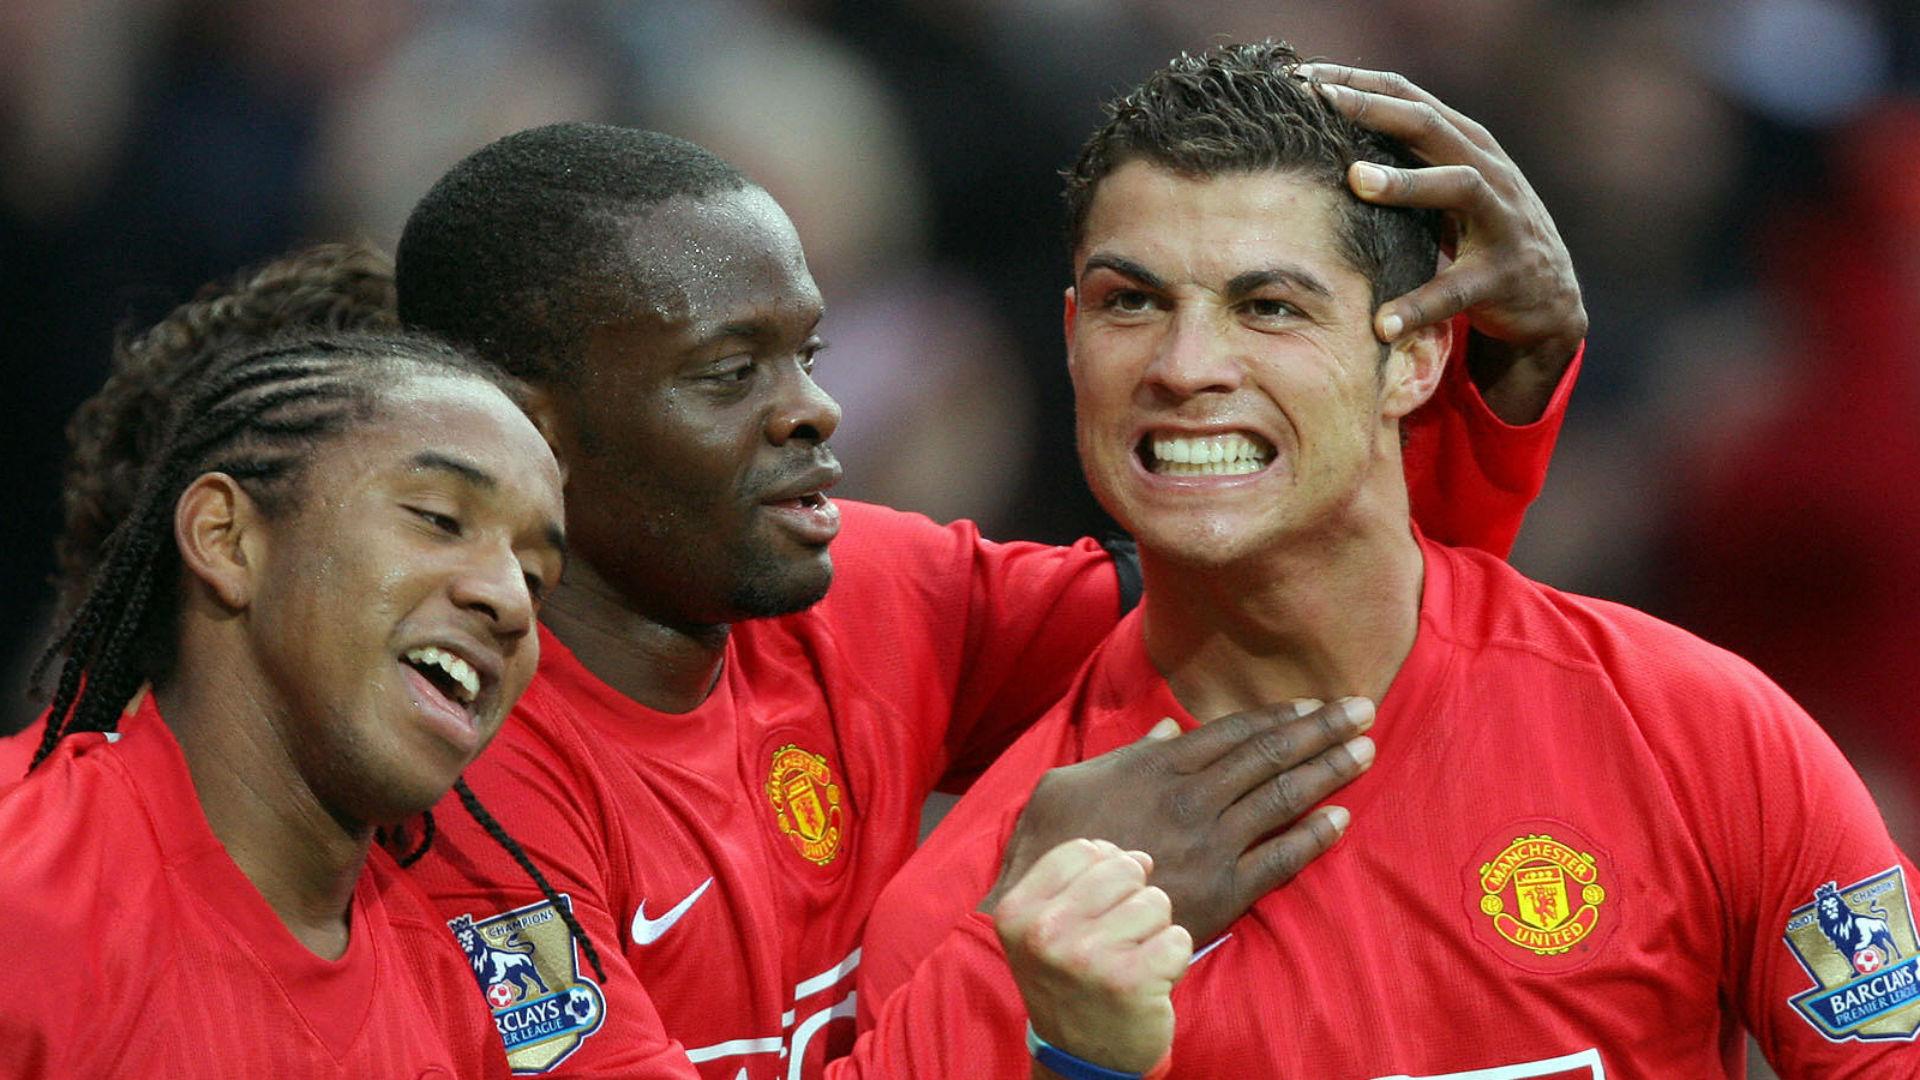 Louis Saha Cristiano Ronaldo